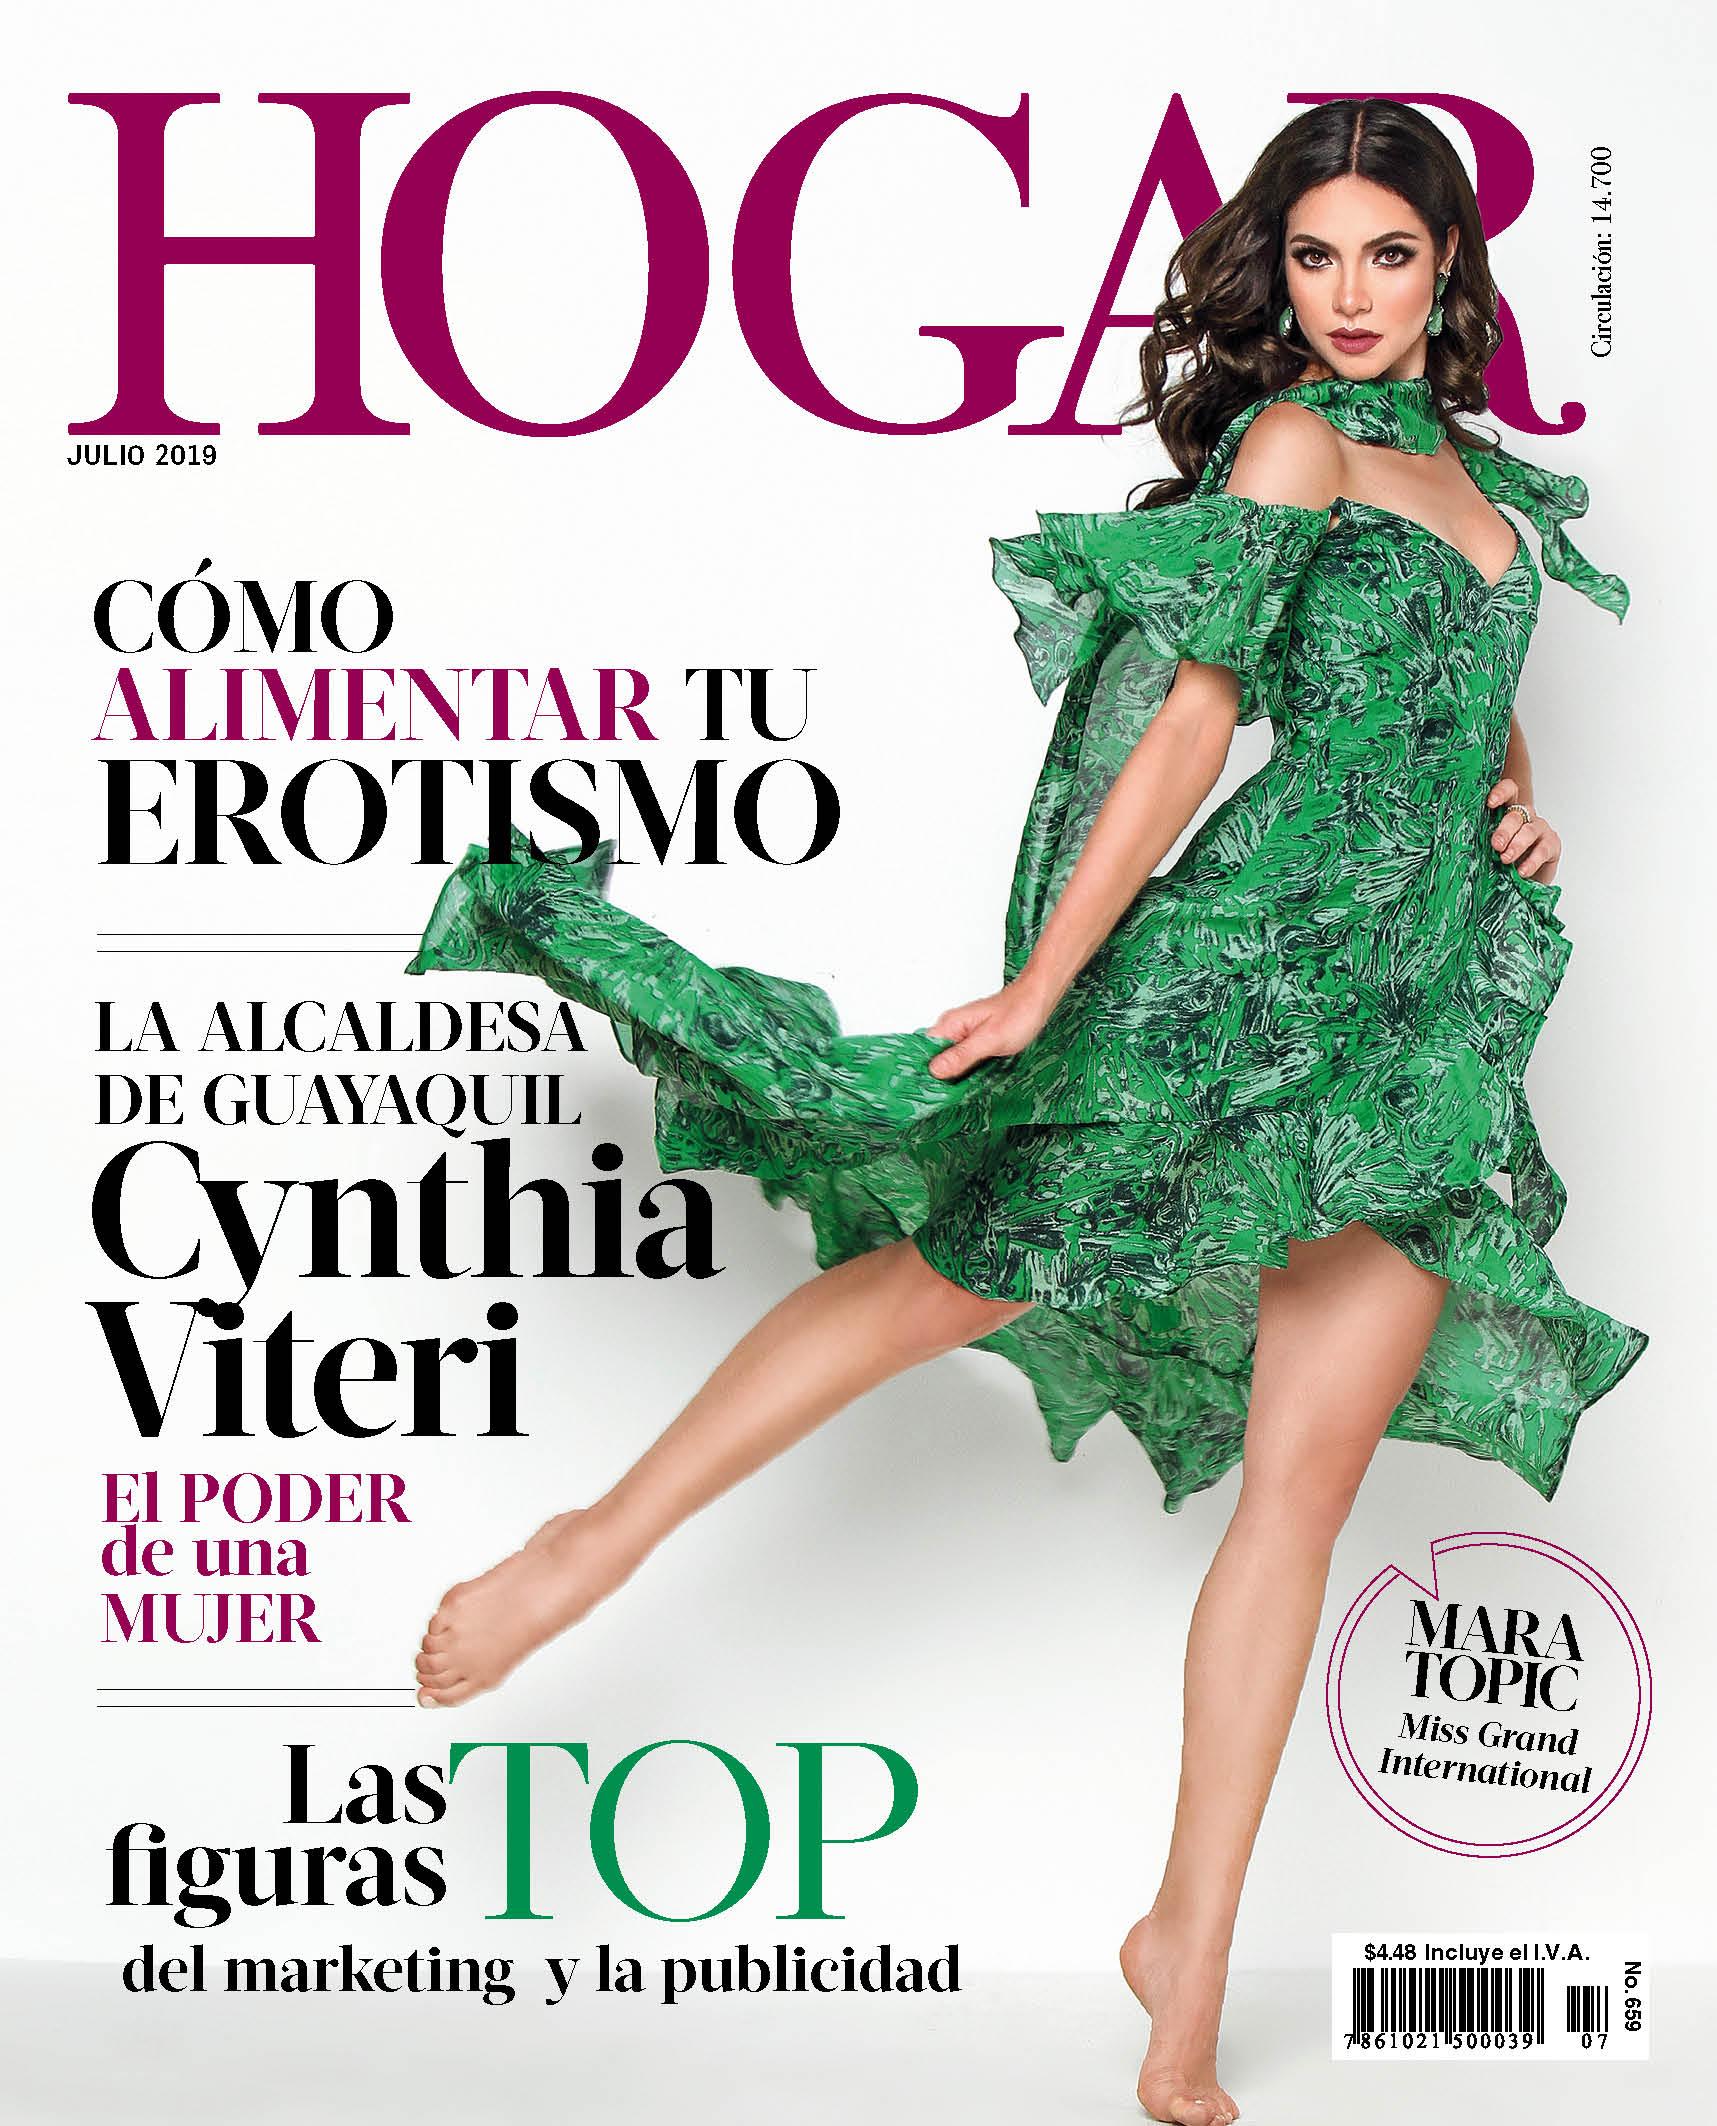 HOGAR - 2019